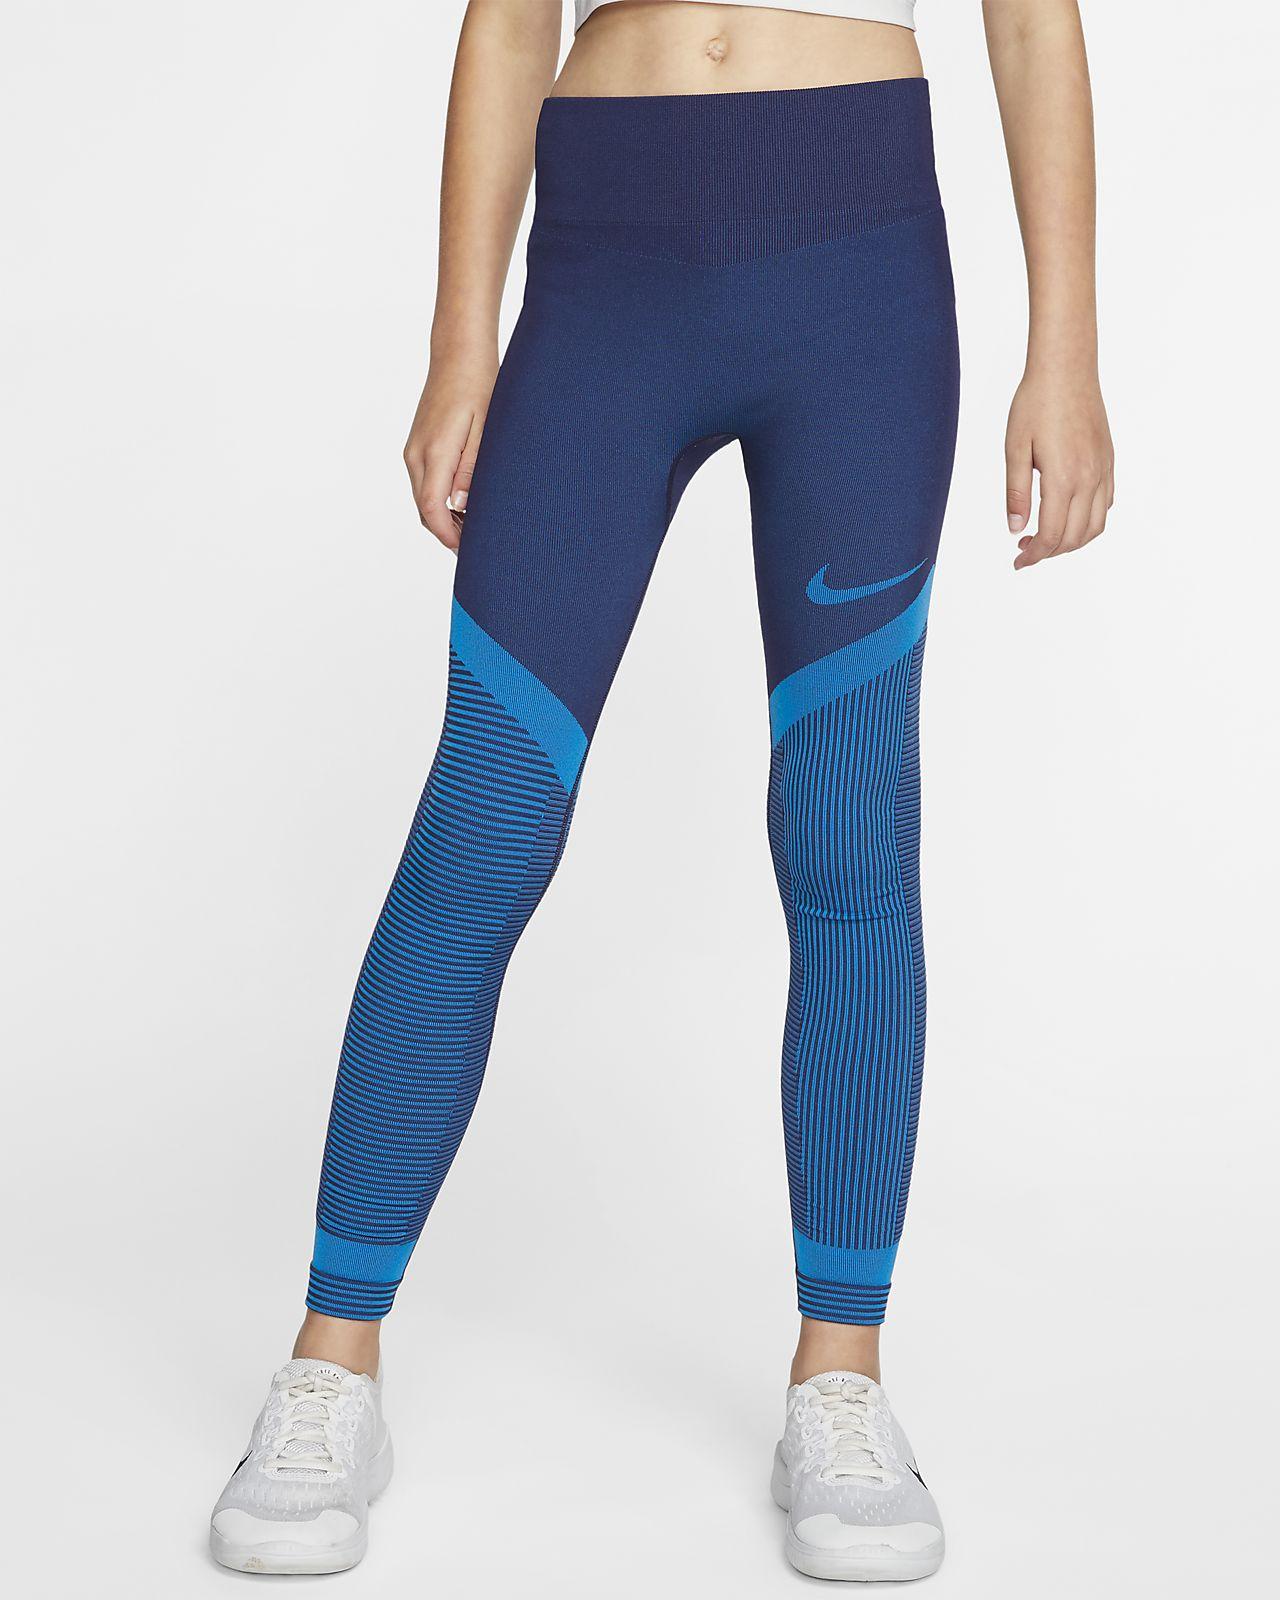 Nike Tech Pack Malles sense costures d'entrenament - Nena